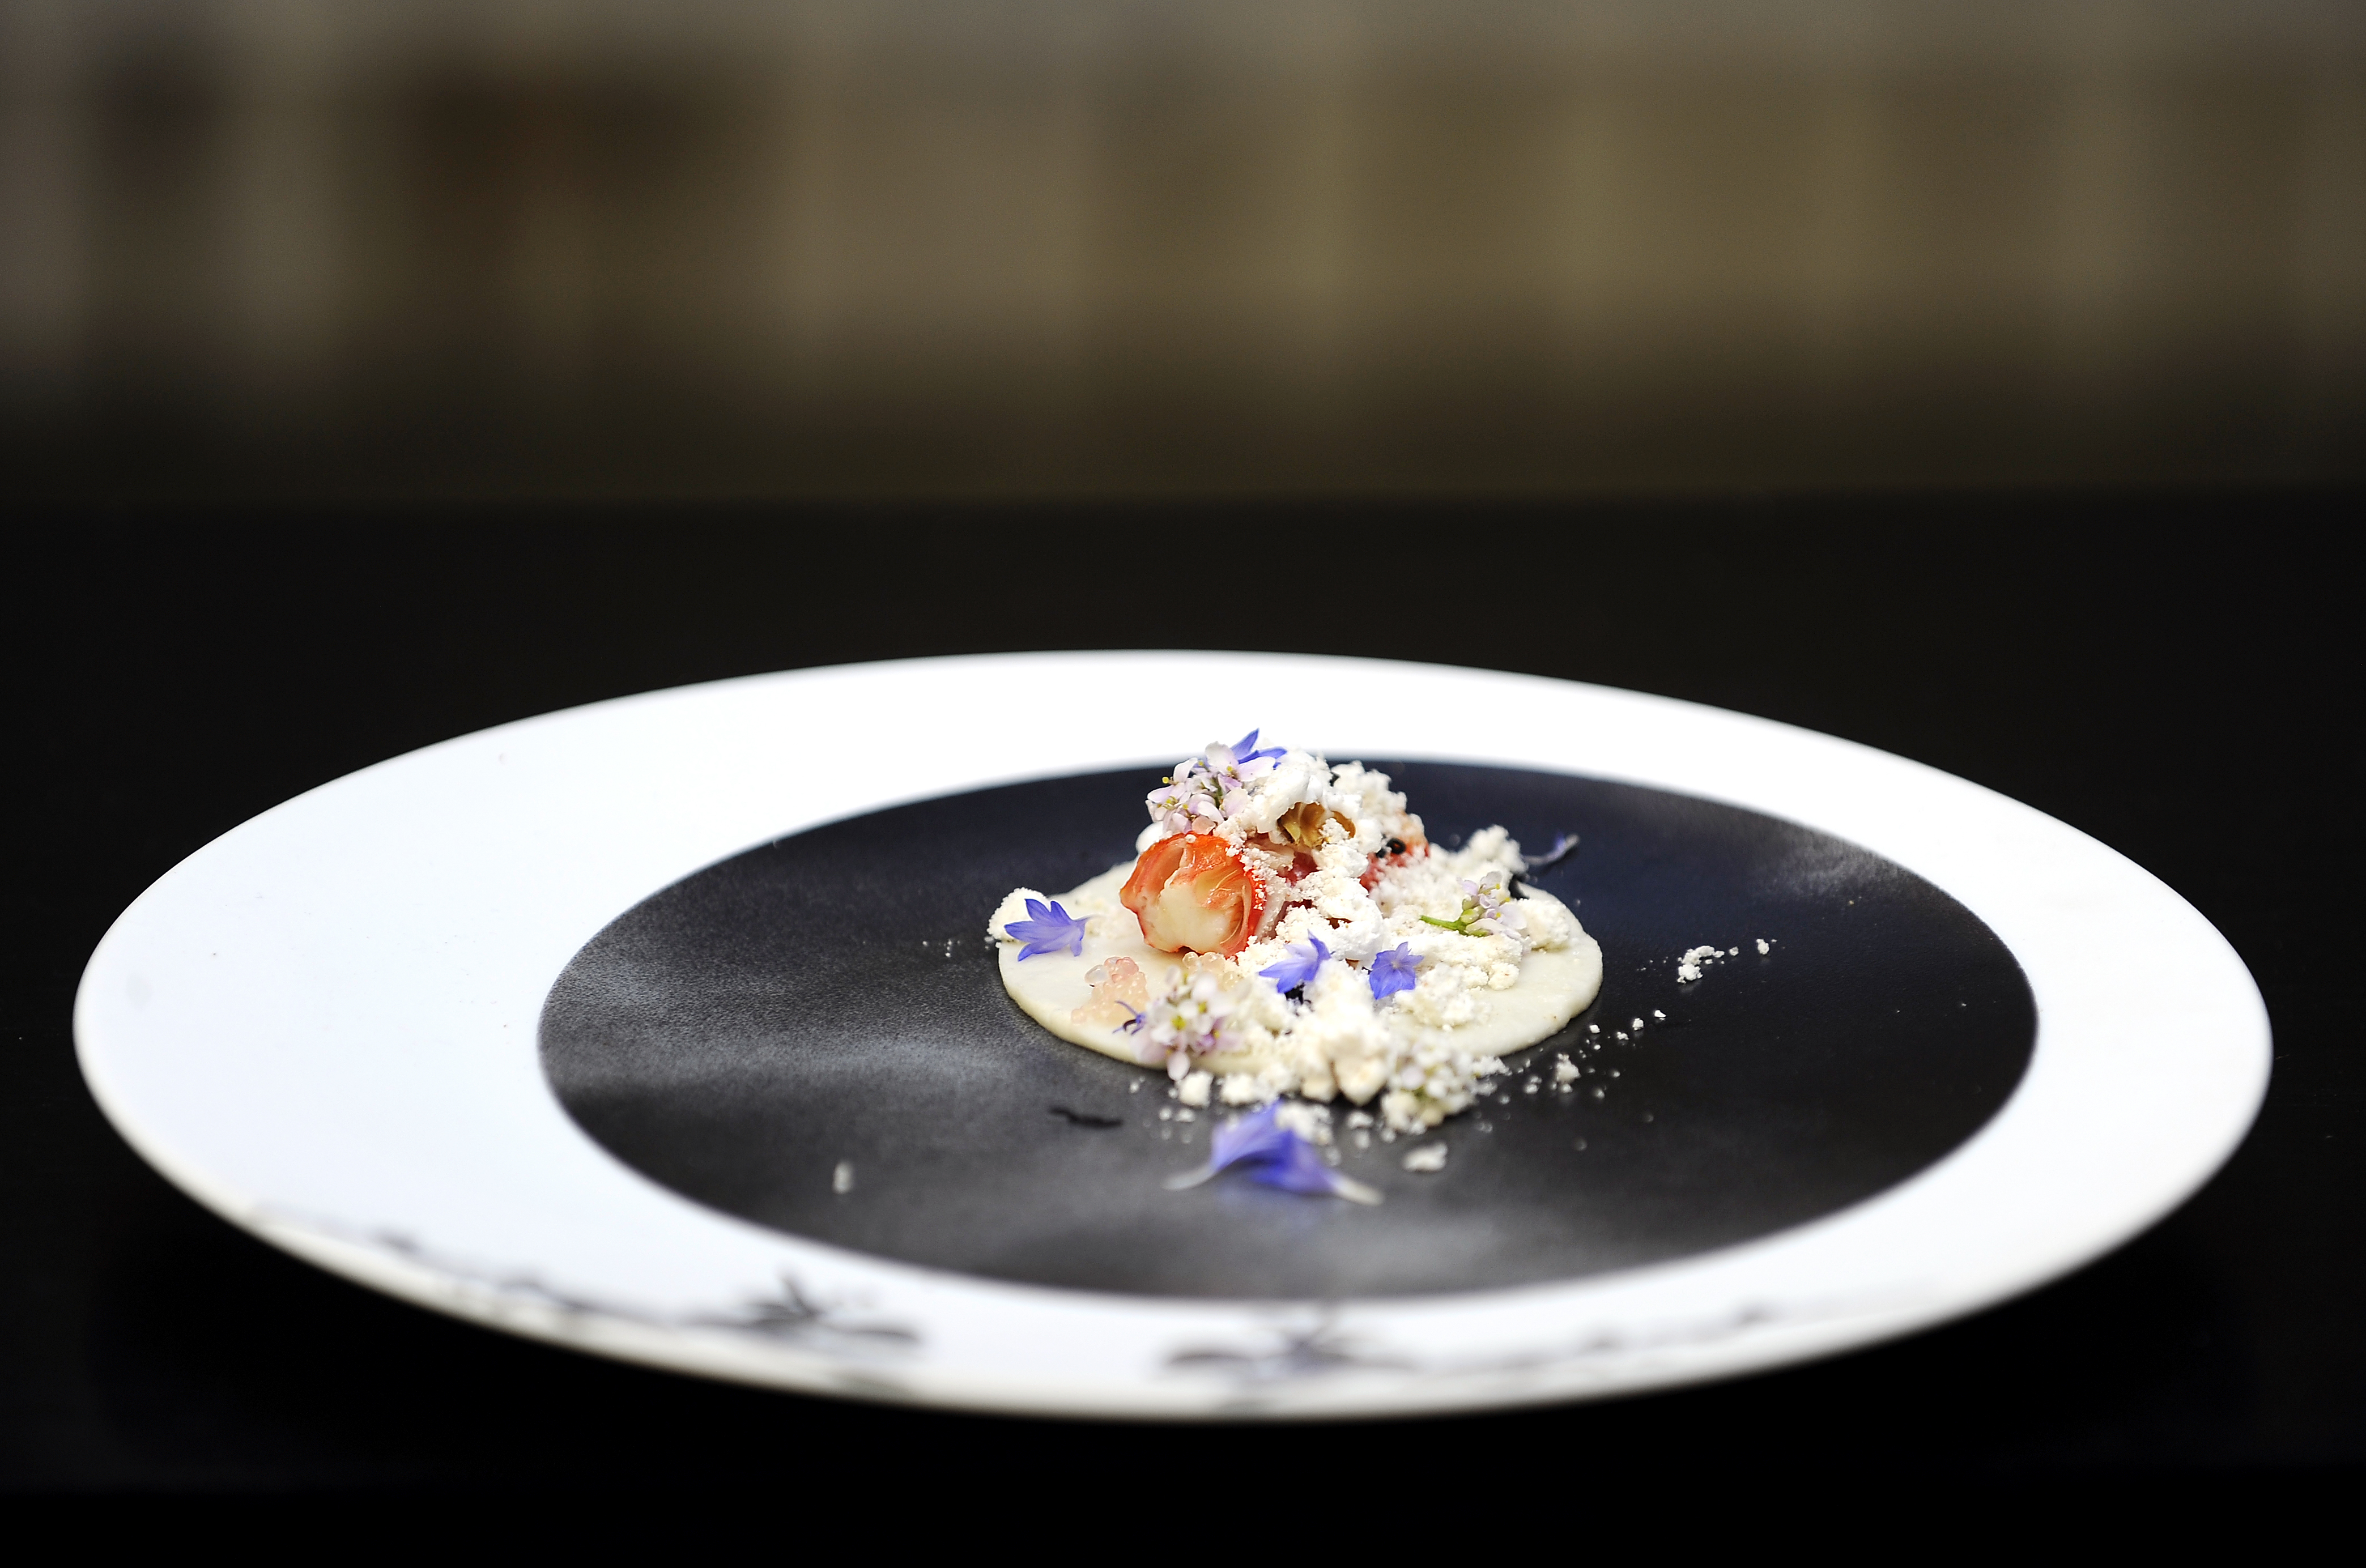 Dish from Dialogue, Santa Monica